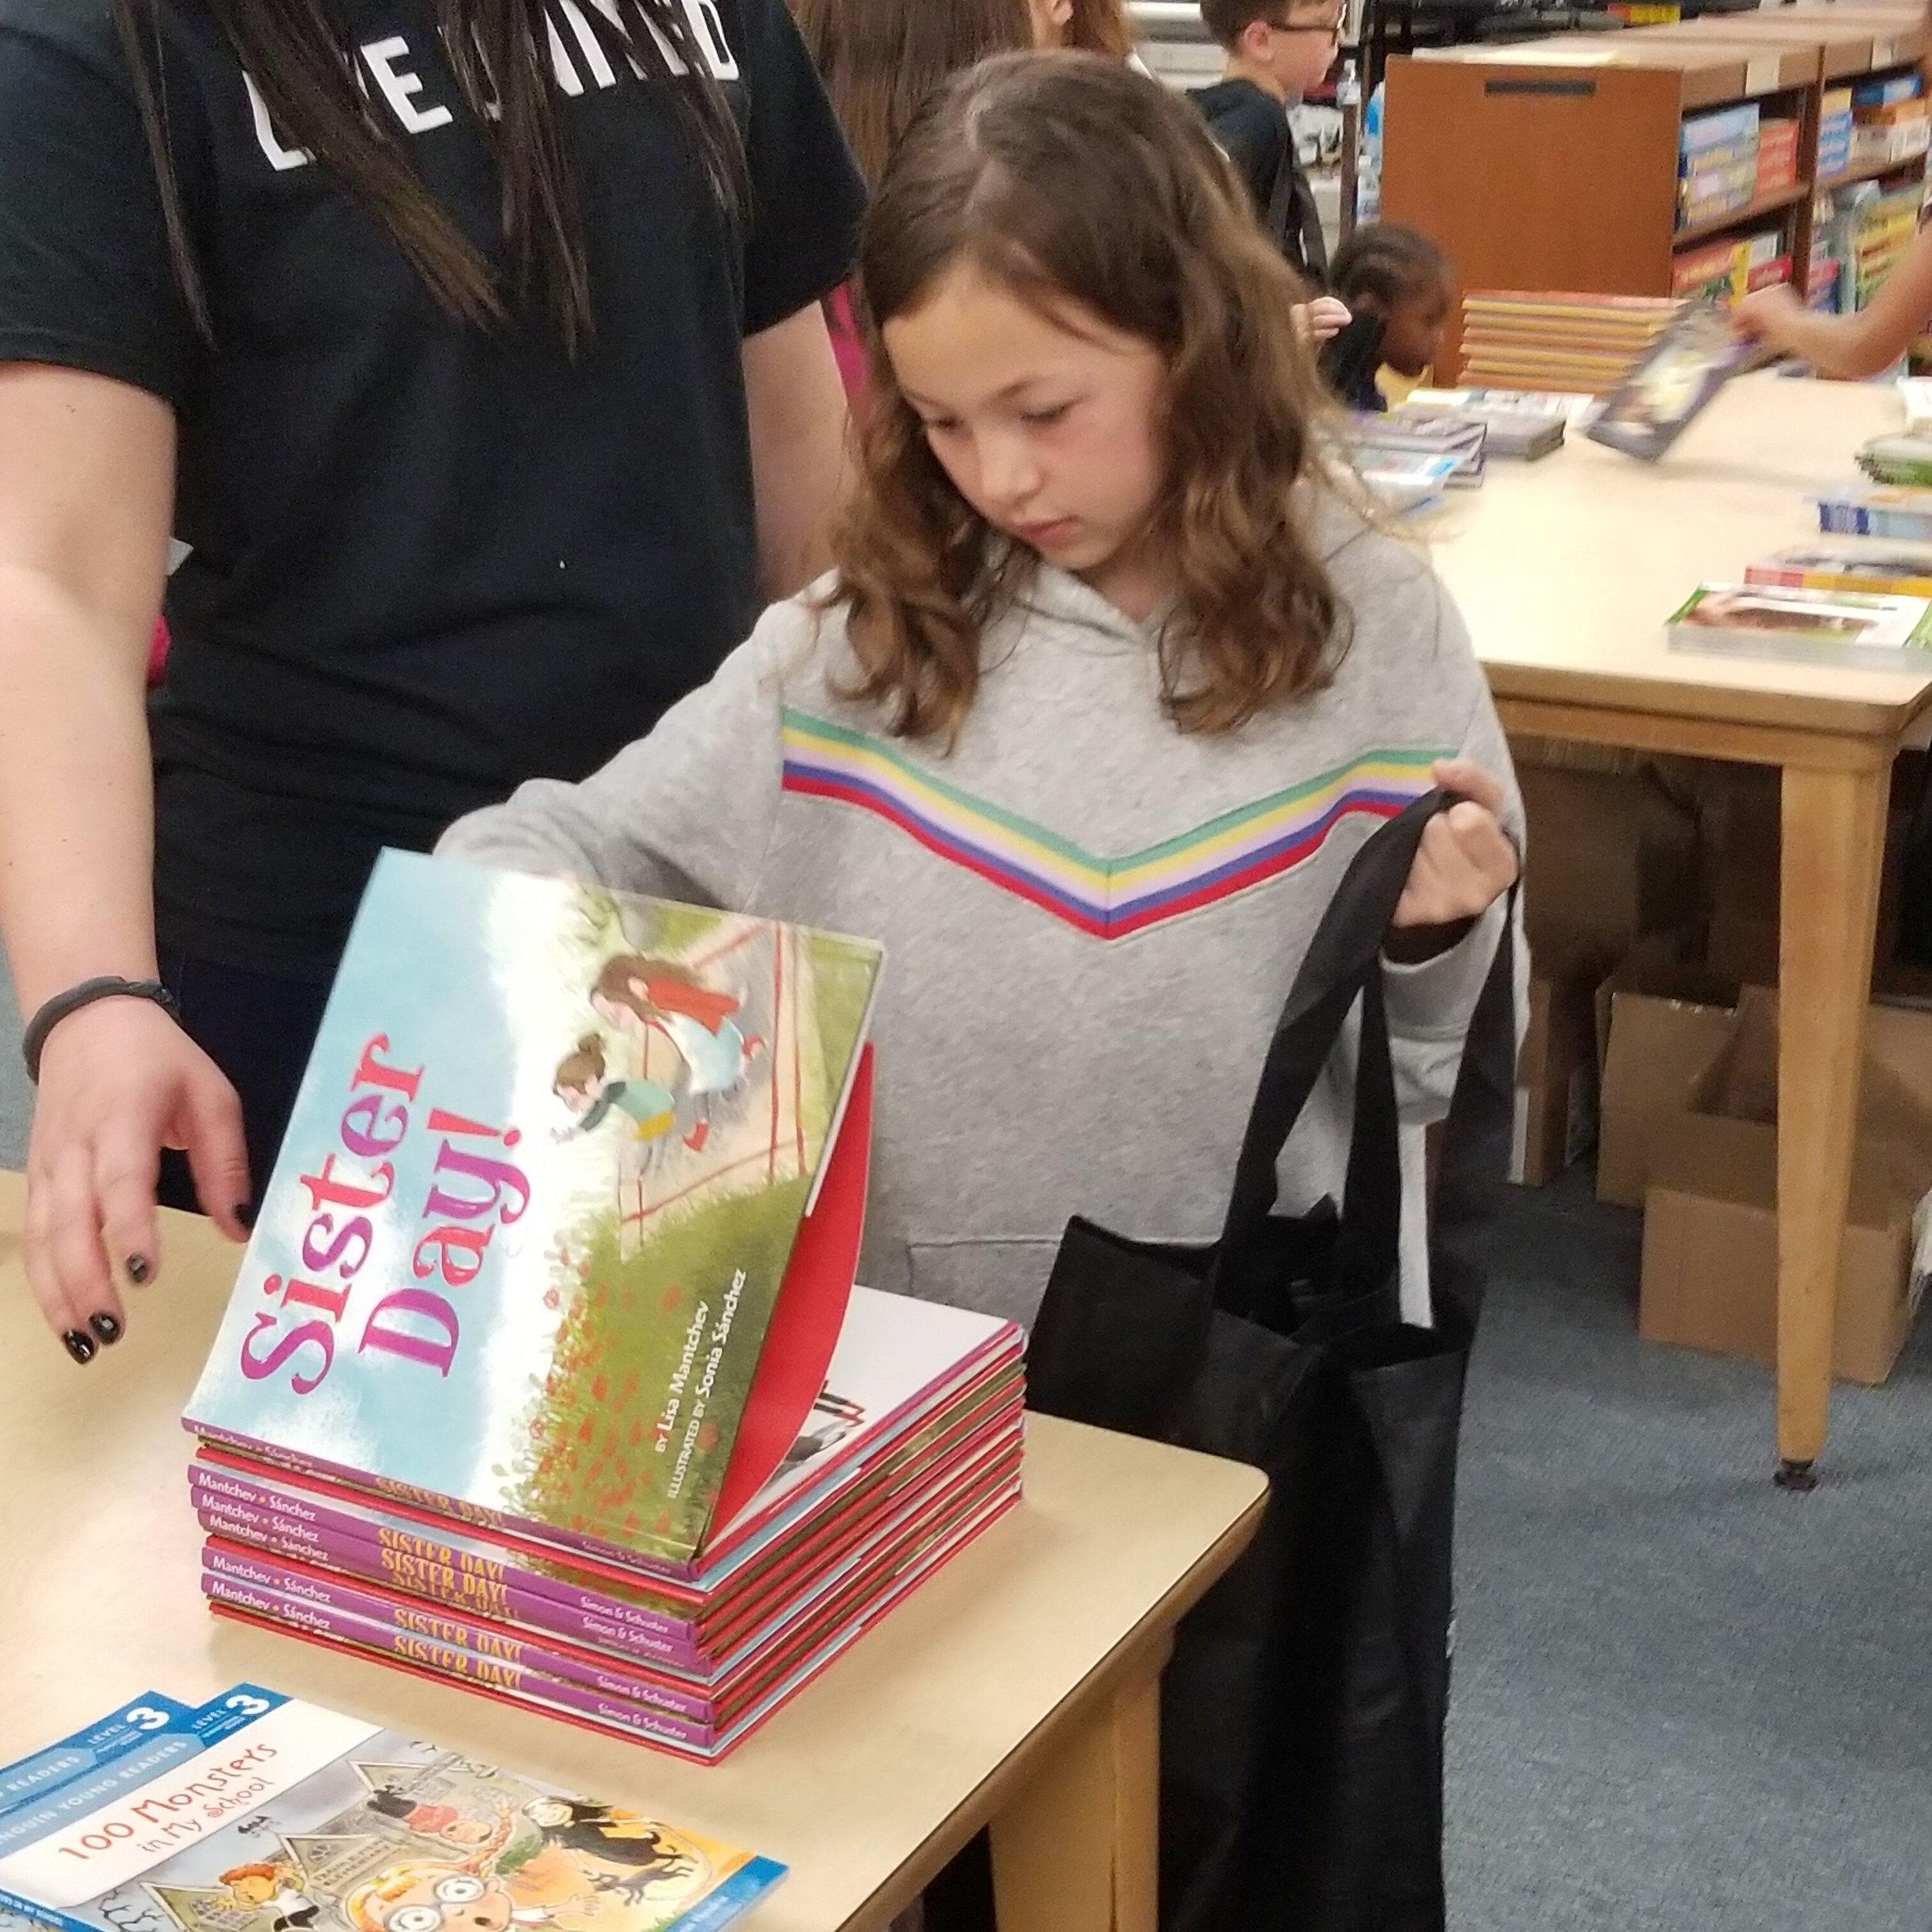 Book Give Away- Cute girl shopping.jpeg